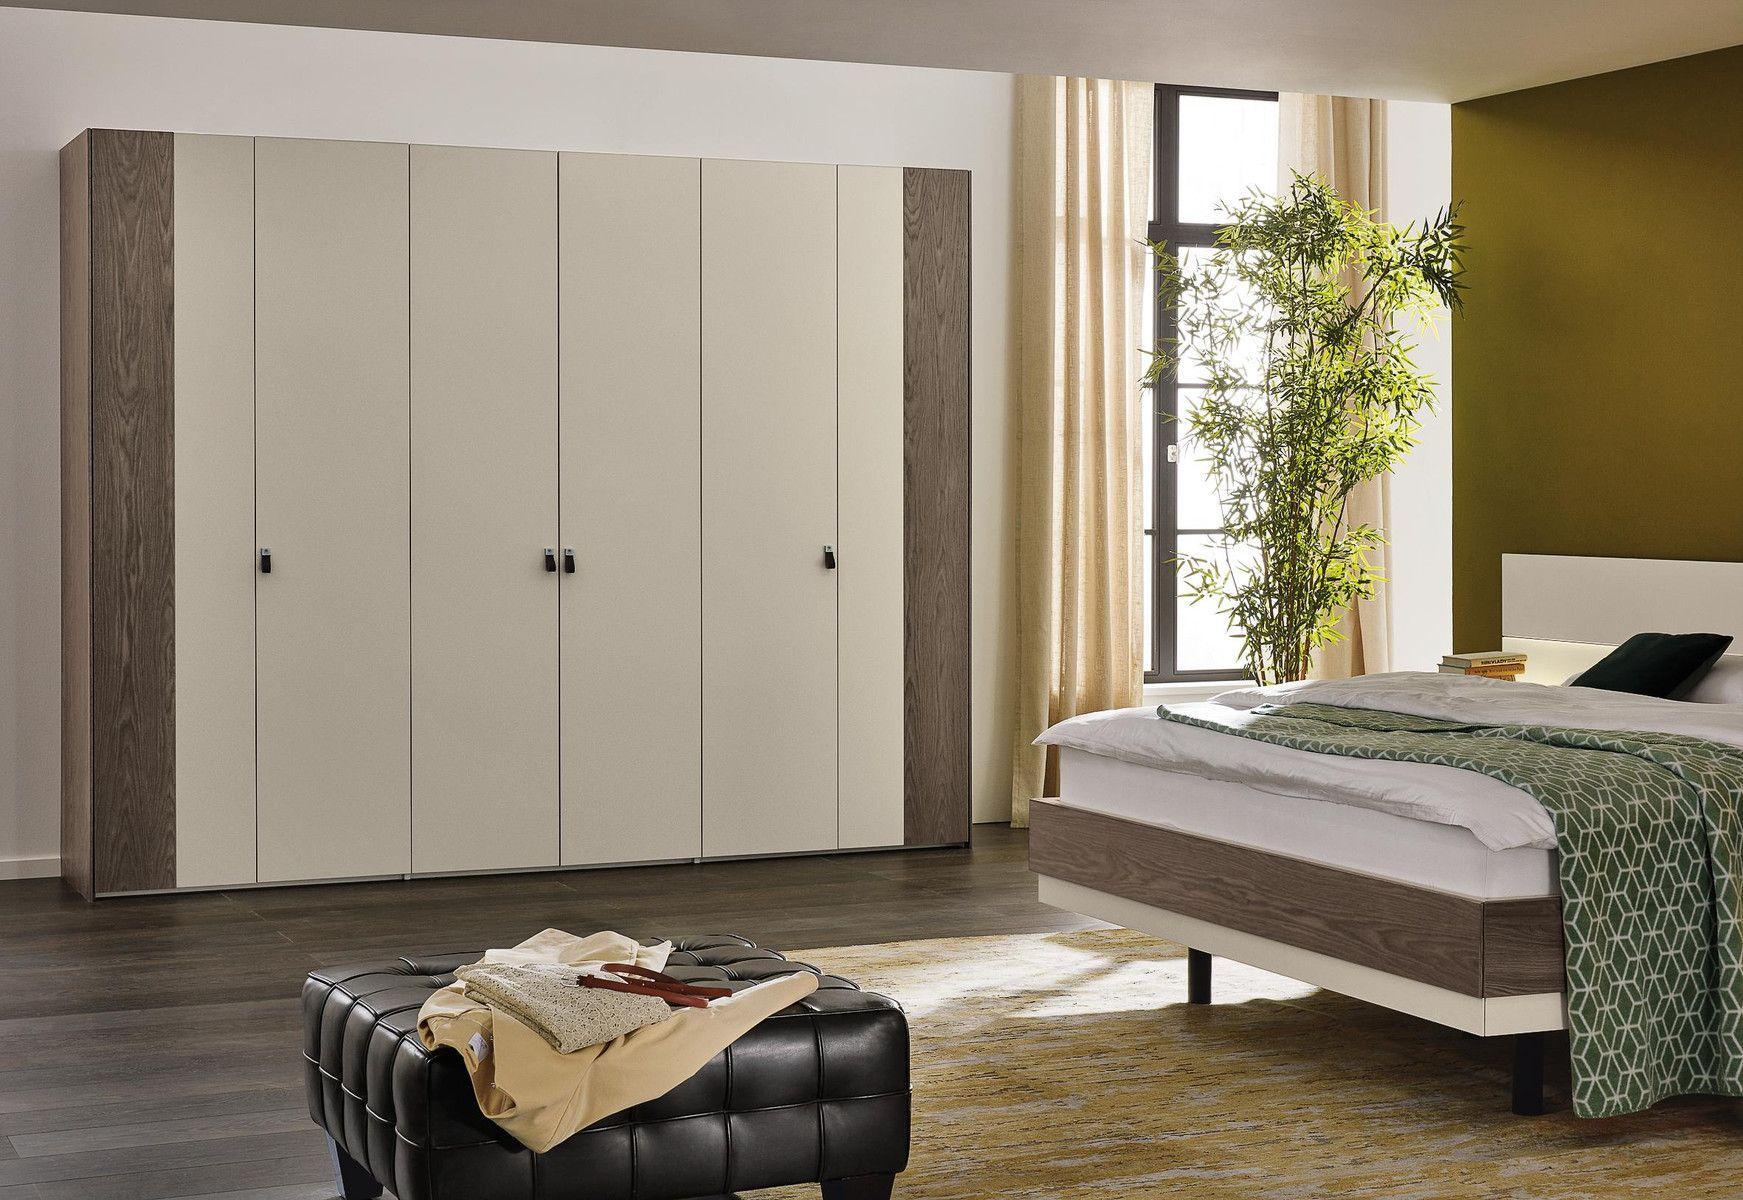 Moderner Kleiderschrank / lackiertes Holz / Falttüren / Schwingtüren ...